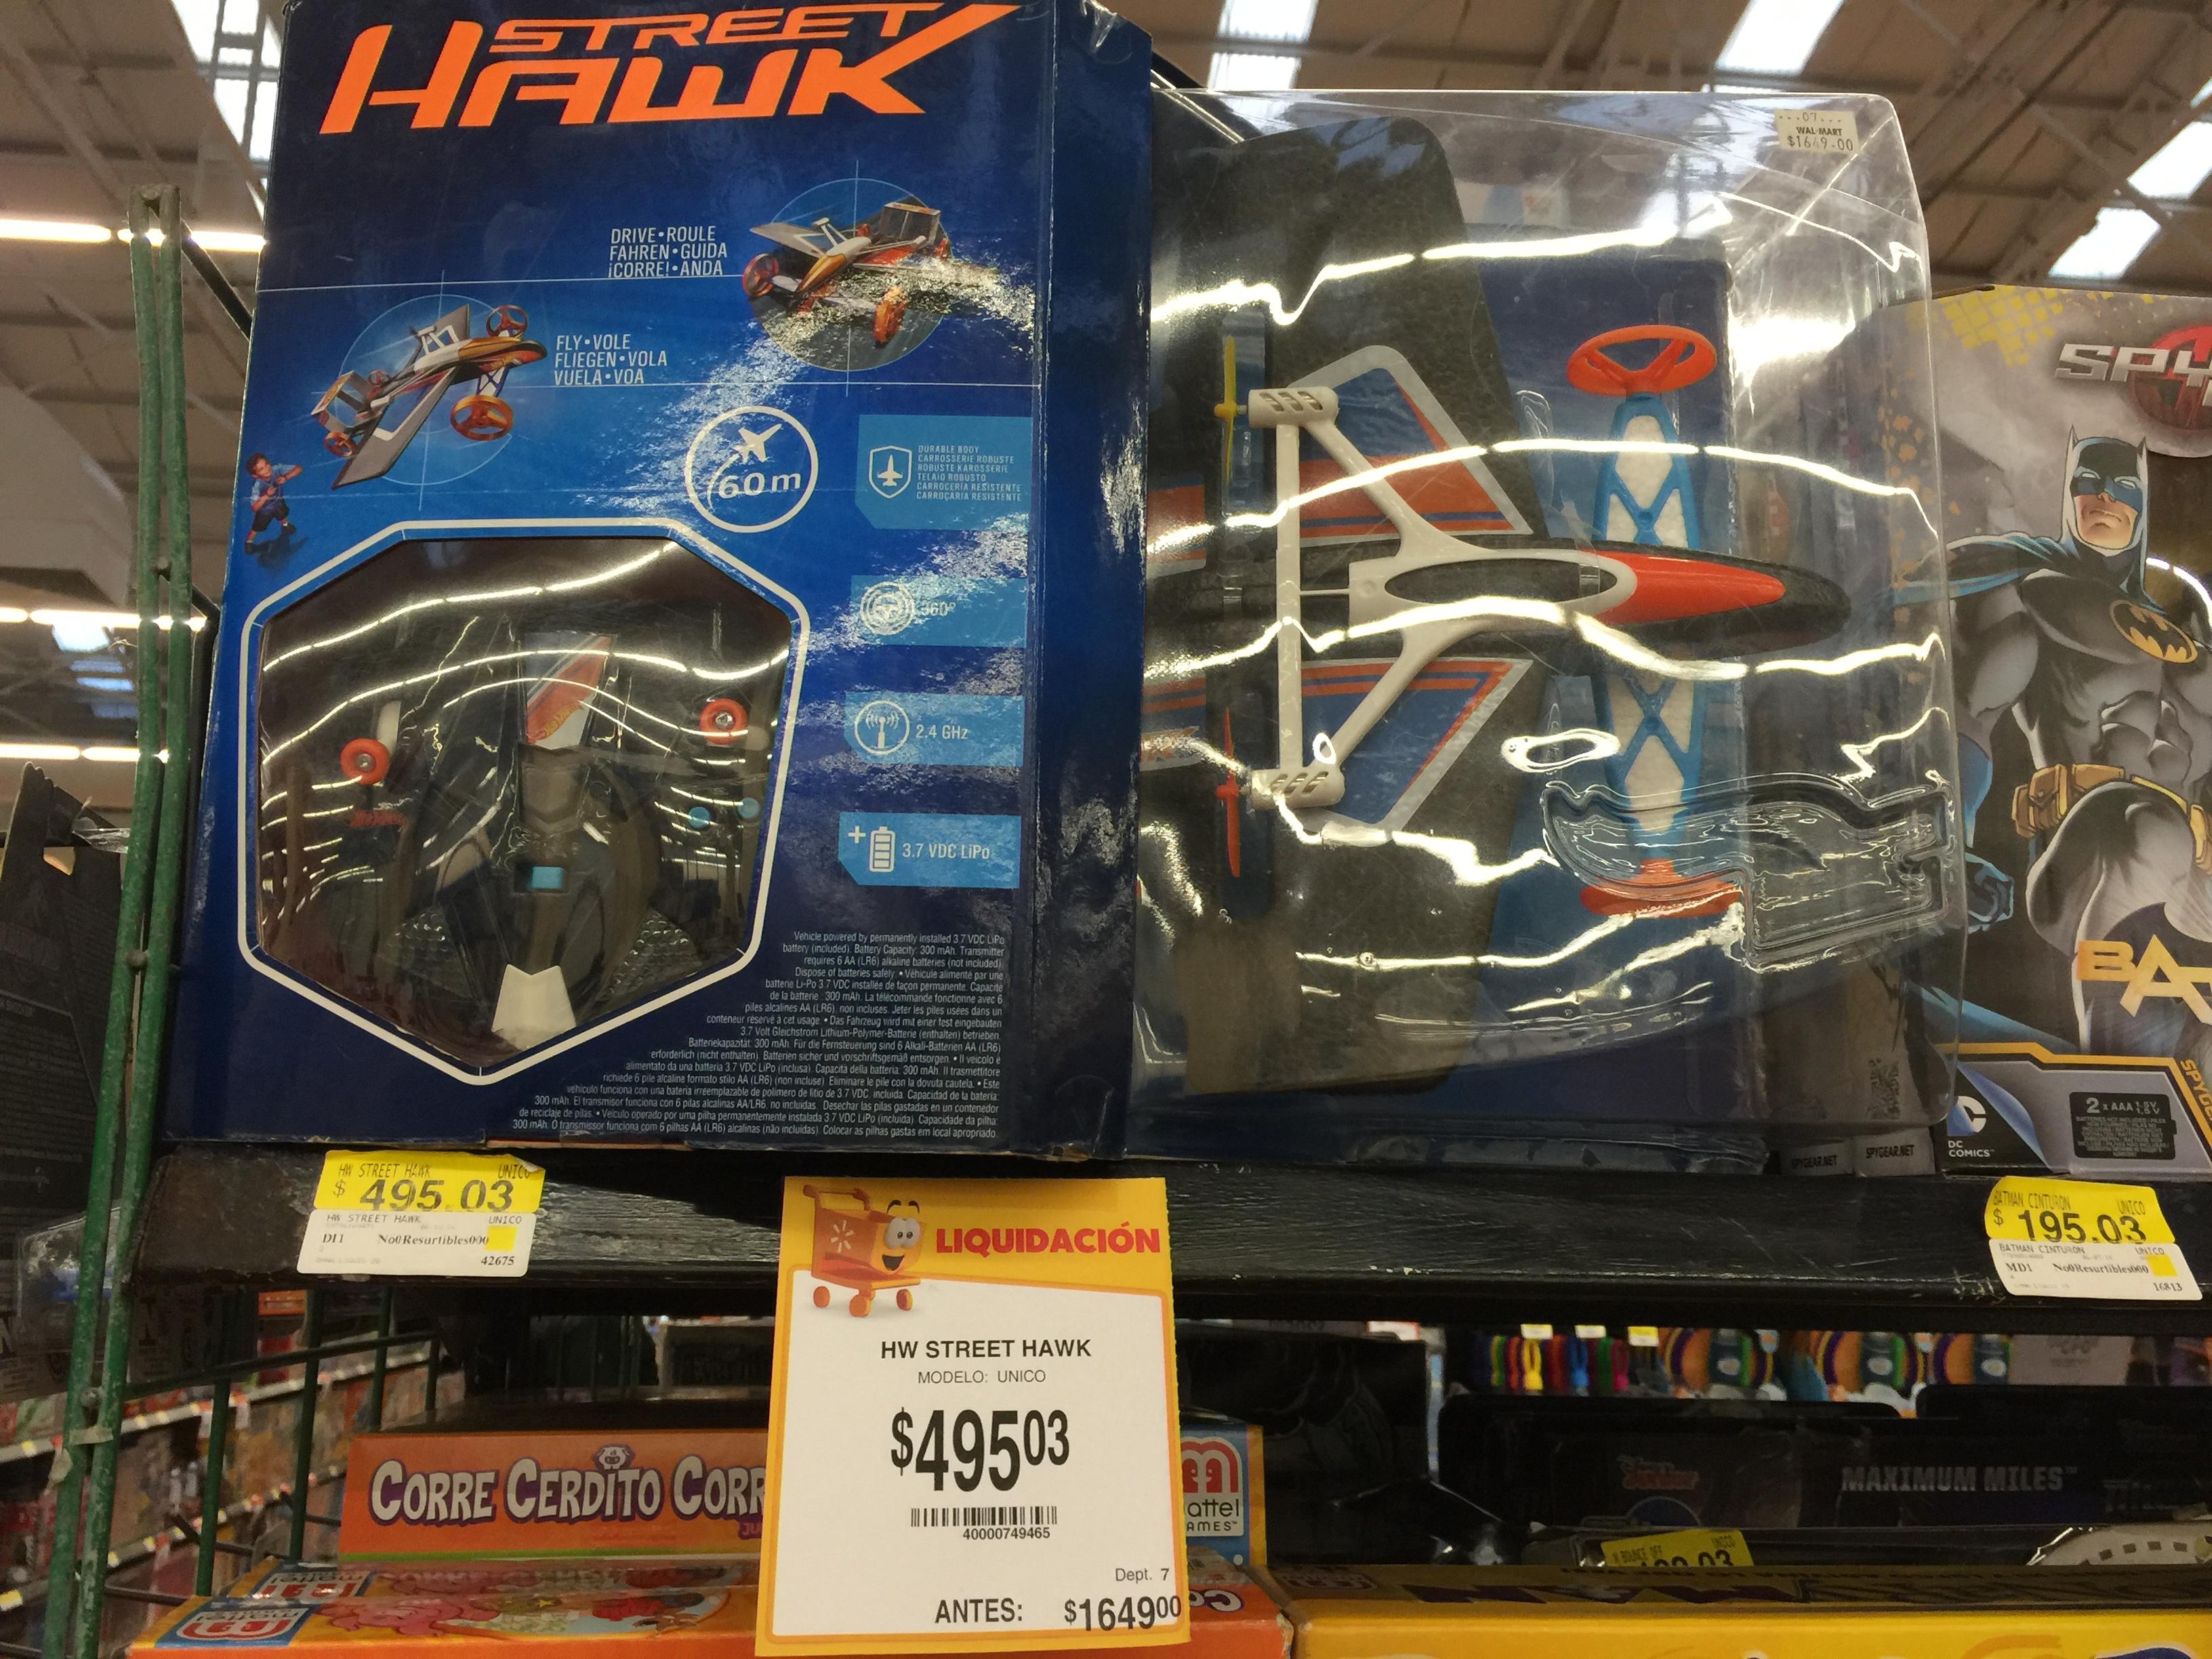 Walmart Buenavista: Hasta 70% de descuento en juguetes, Hot Wheels Street Hawk a $495.03, Tostador para 4 rebanadas a $219.01